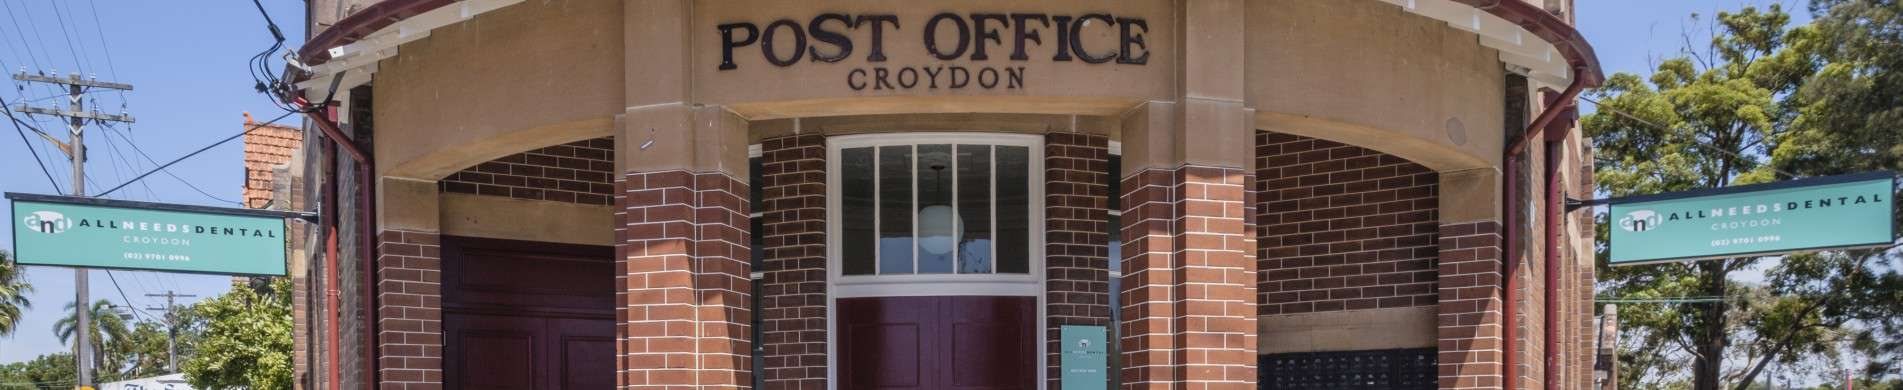 all needs dental croydon dentist NSW inner west